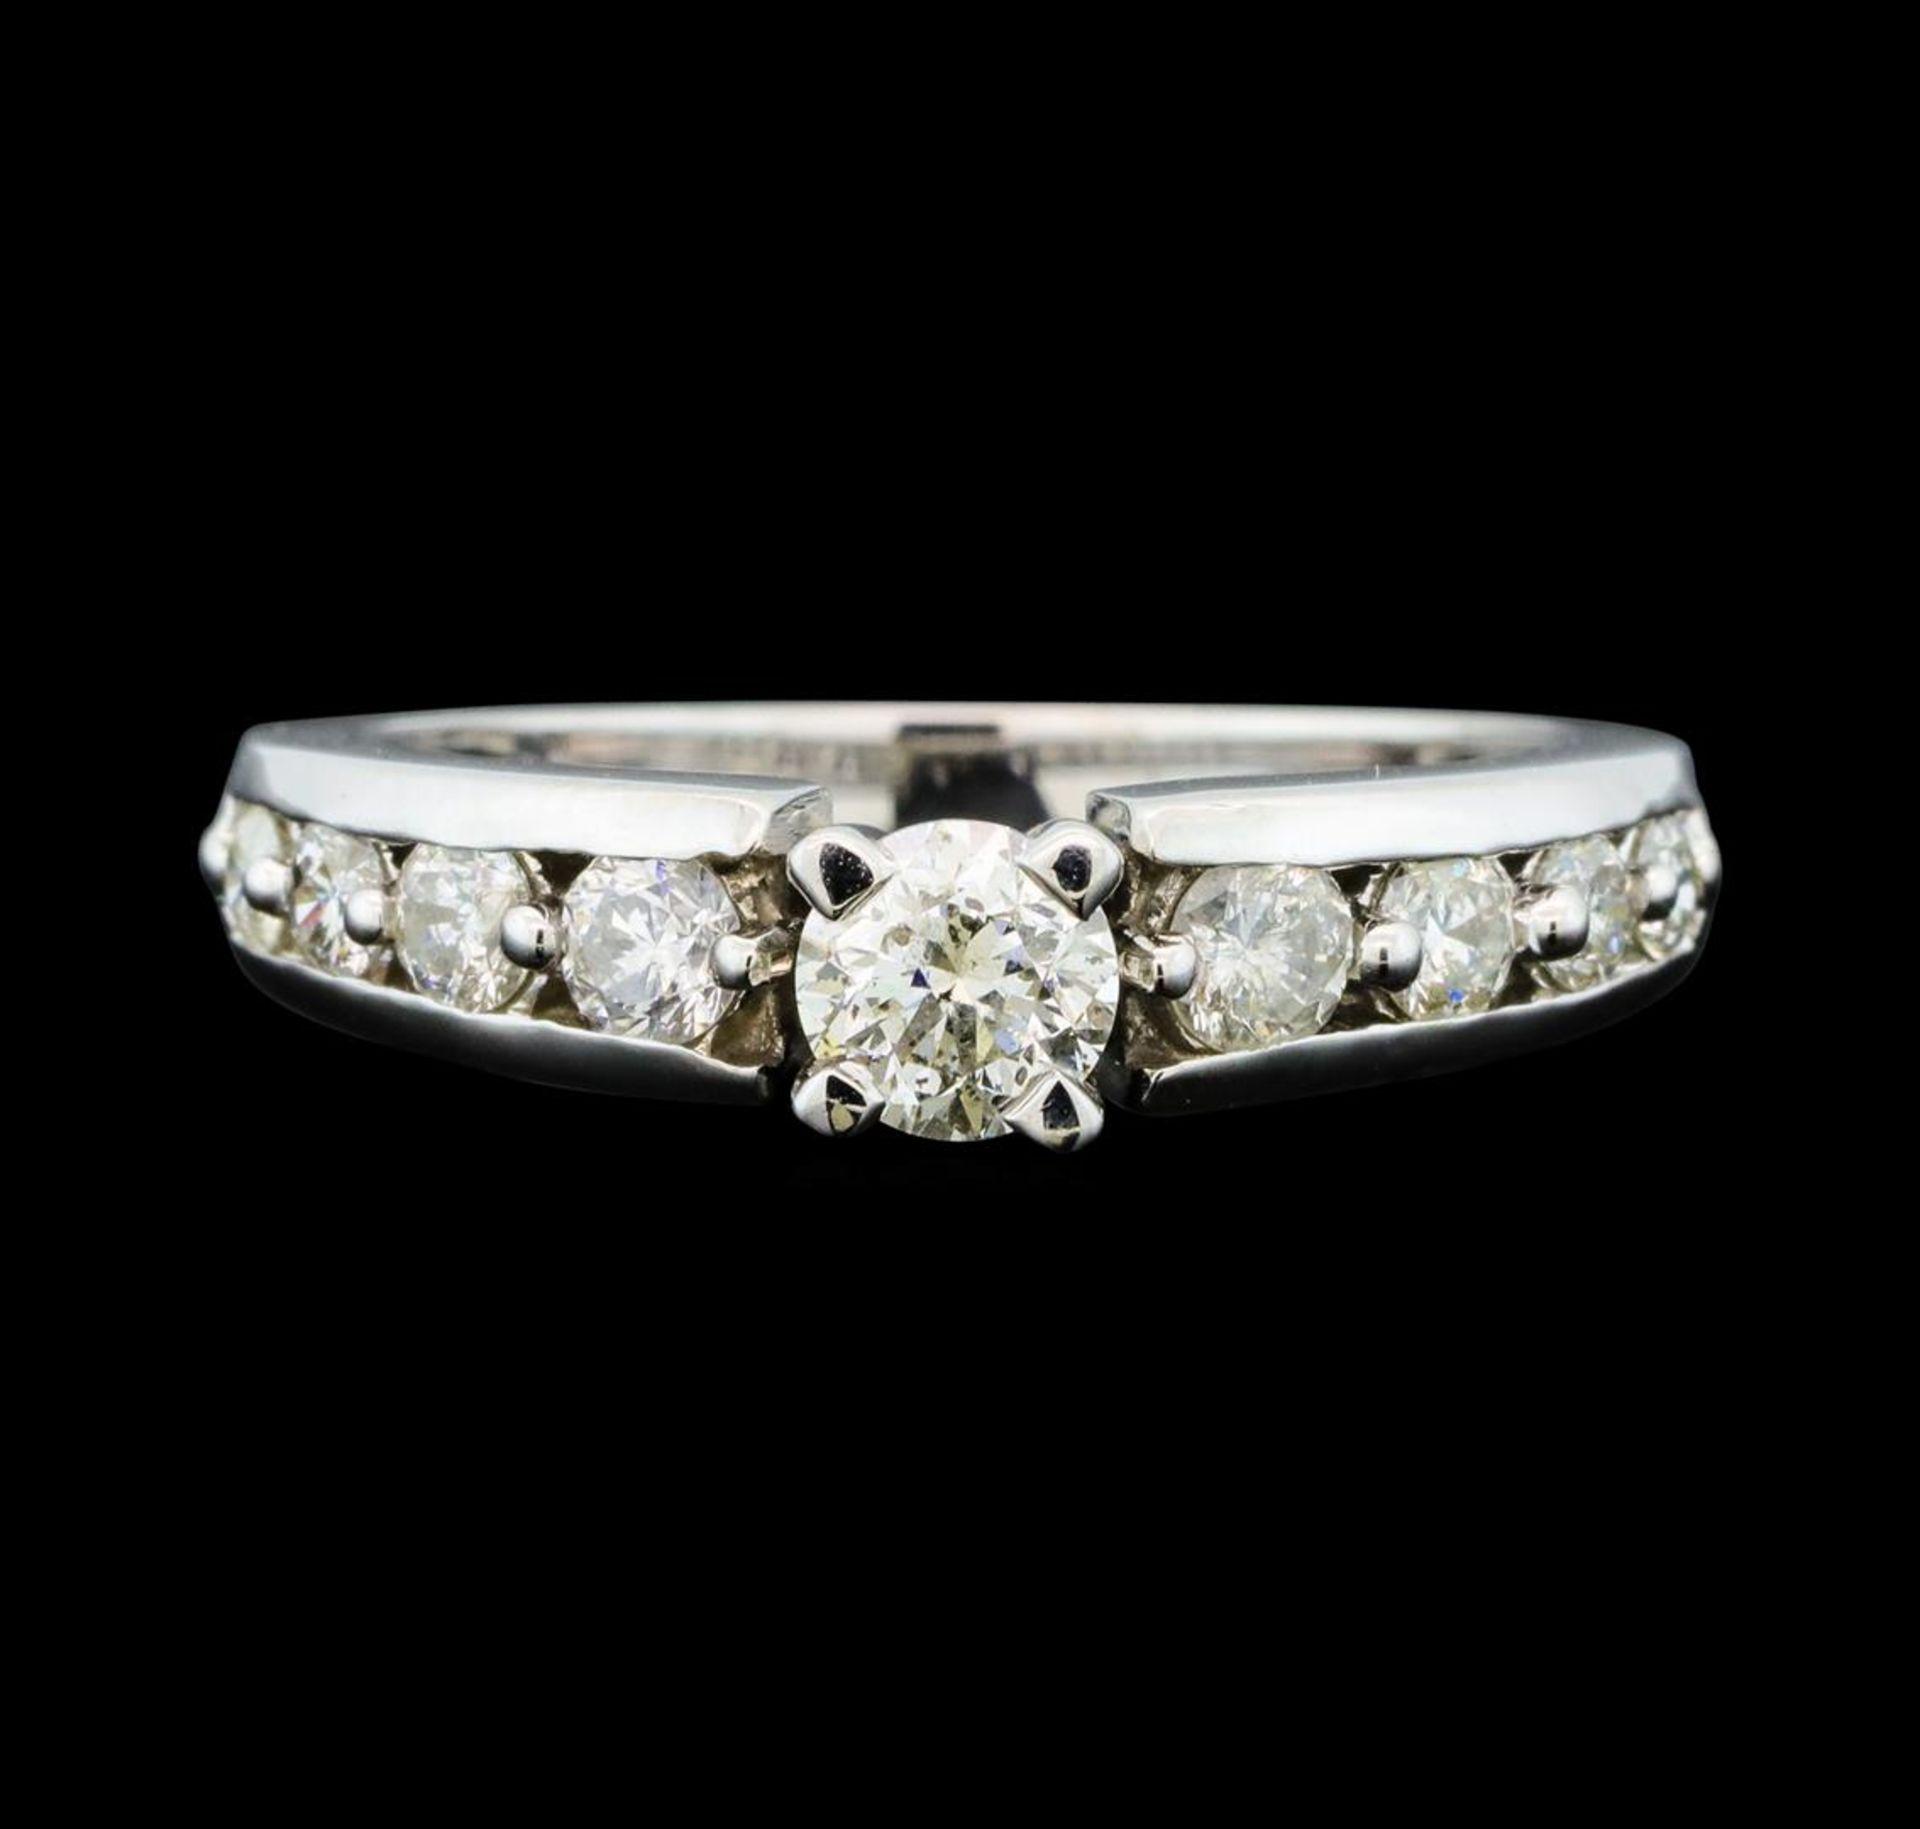 0.50 ctw Diamond Ring - 14KT White Gold - Image 2 of 4